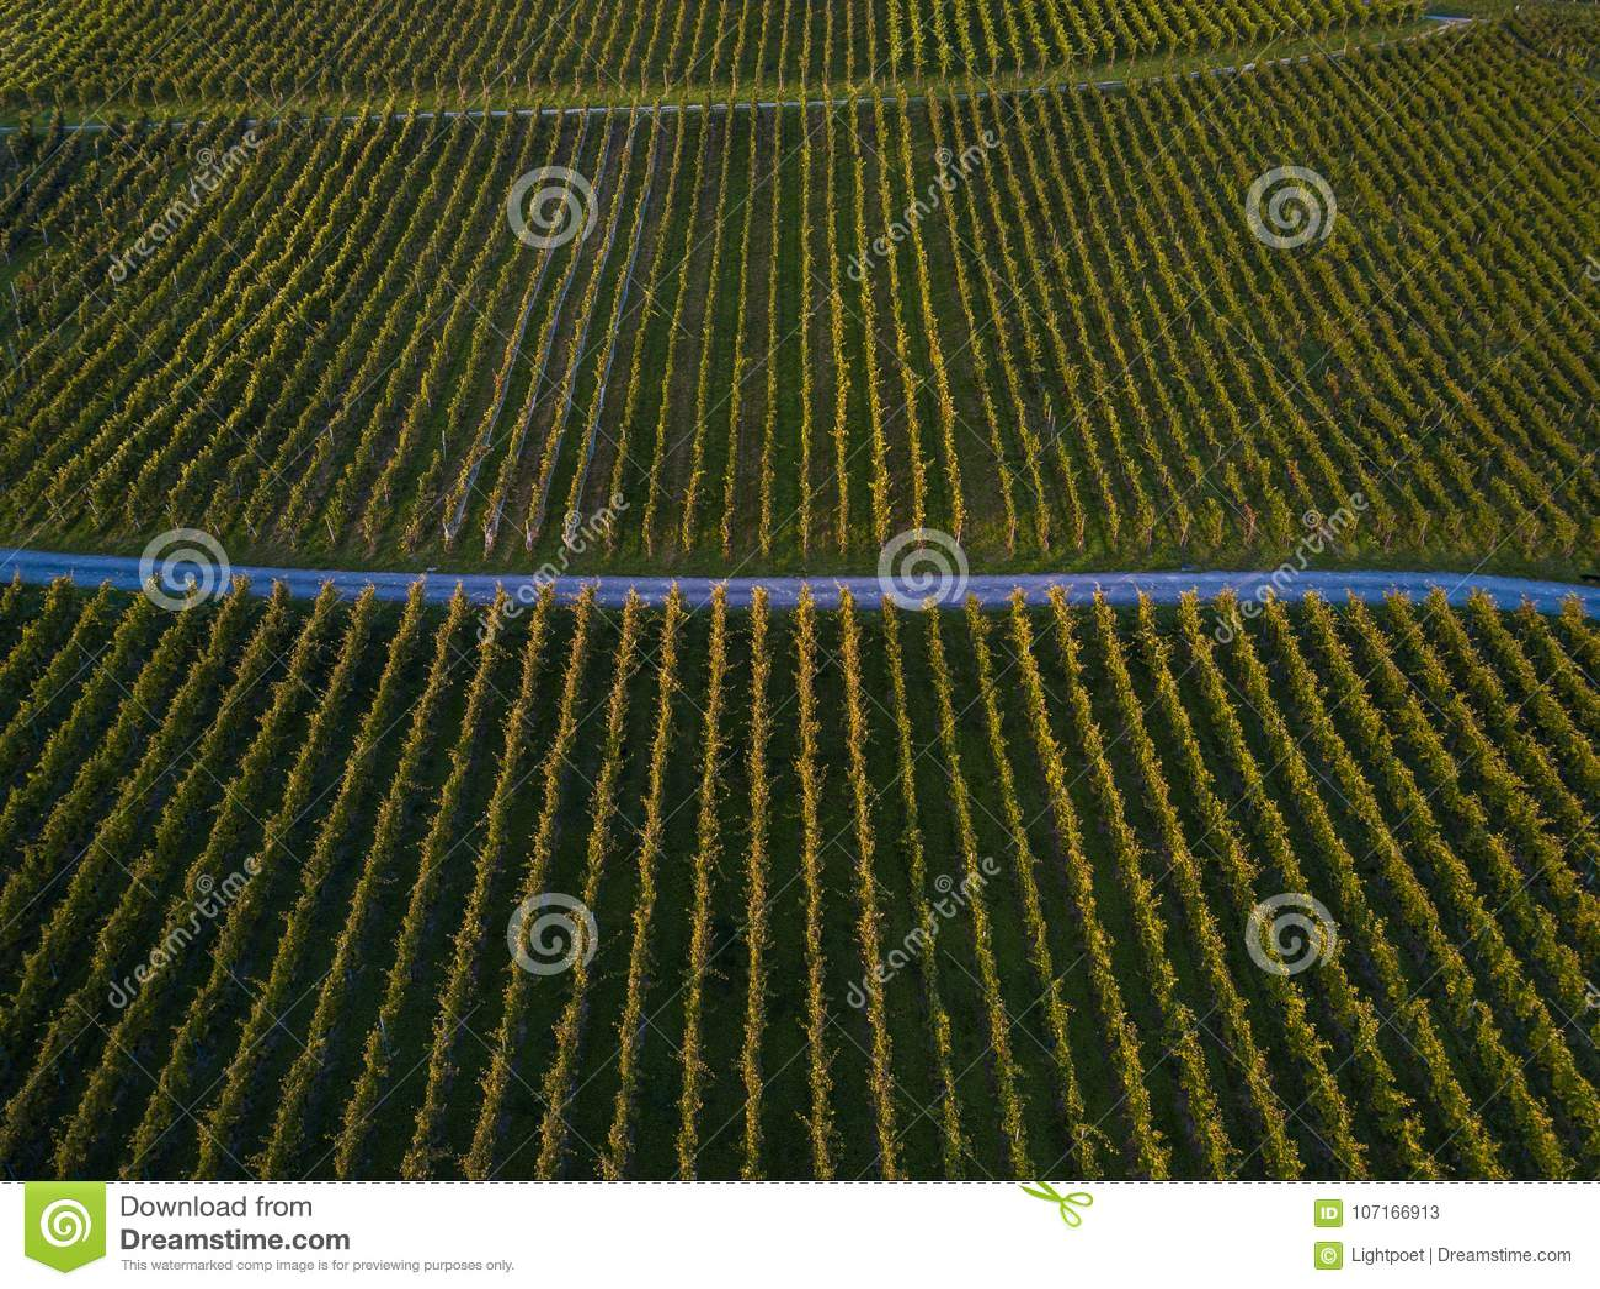 Aerial view over vineyard fields